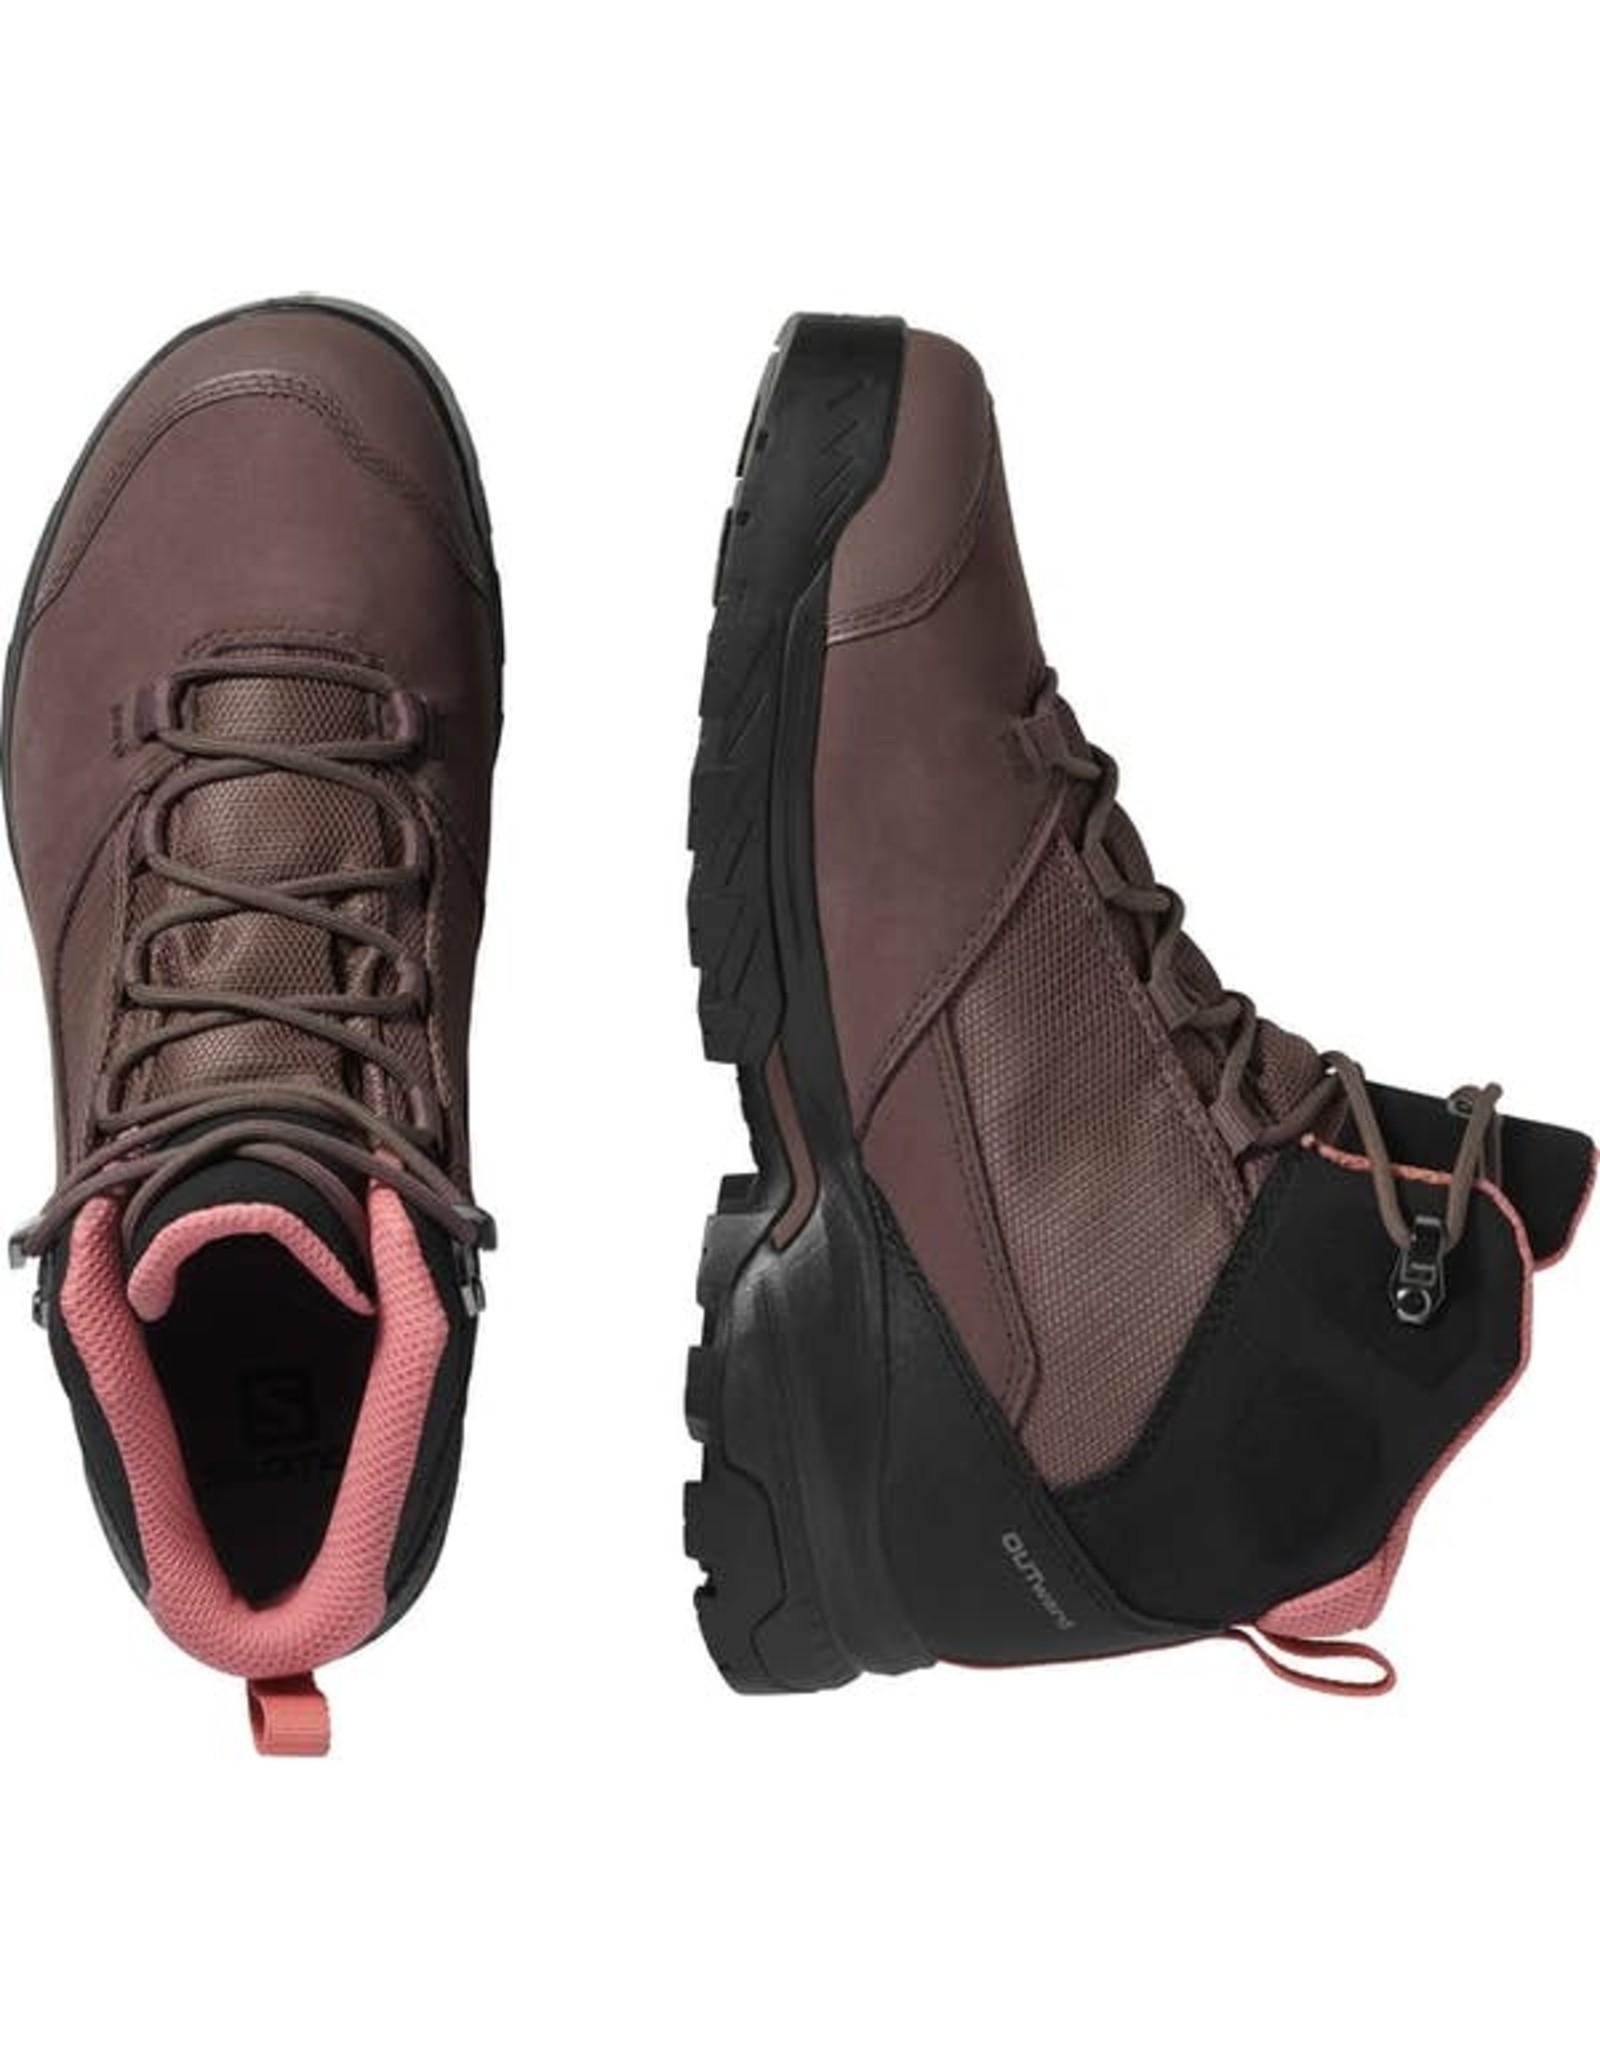 Salomon Salomon Outward Gore-Tex Women's Hiking Boots